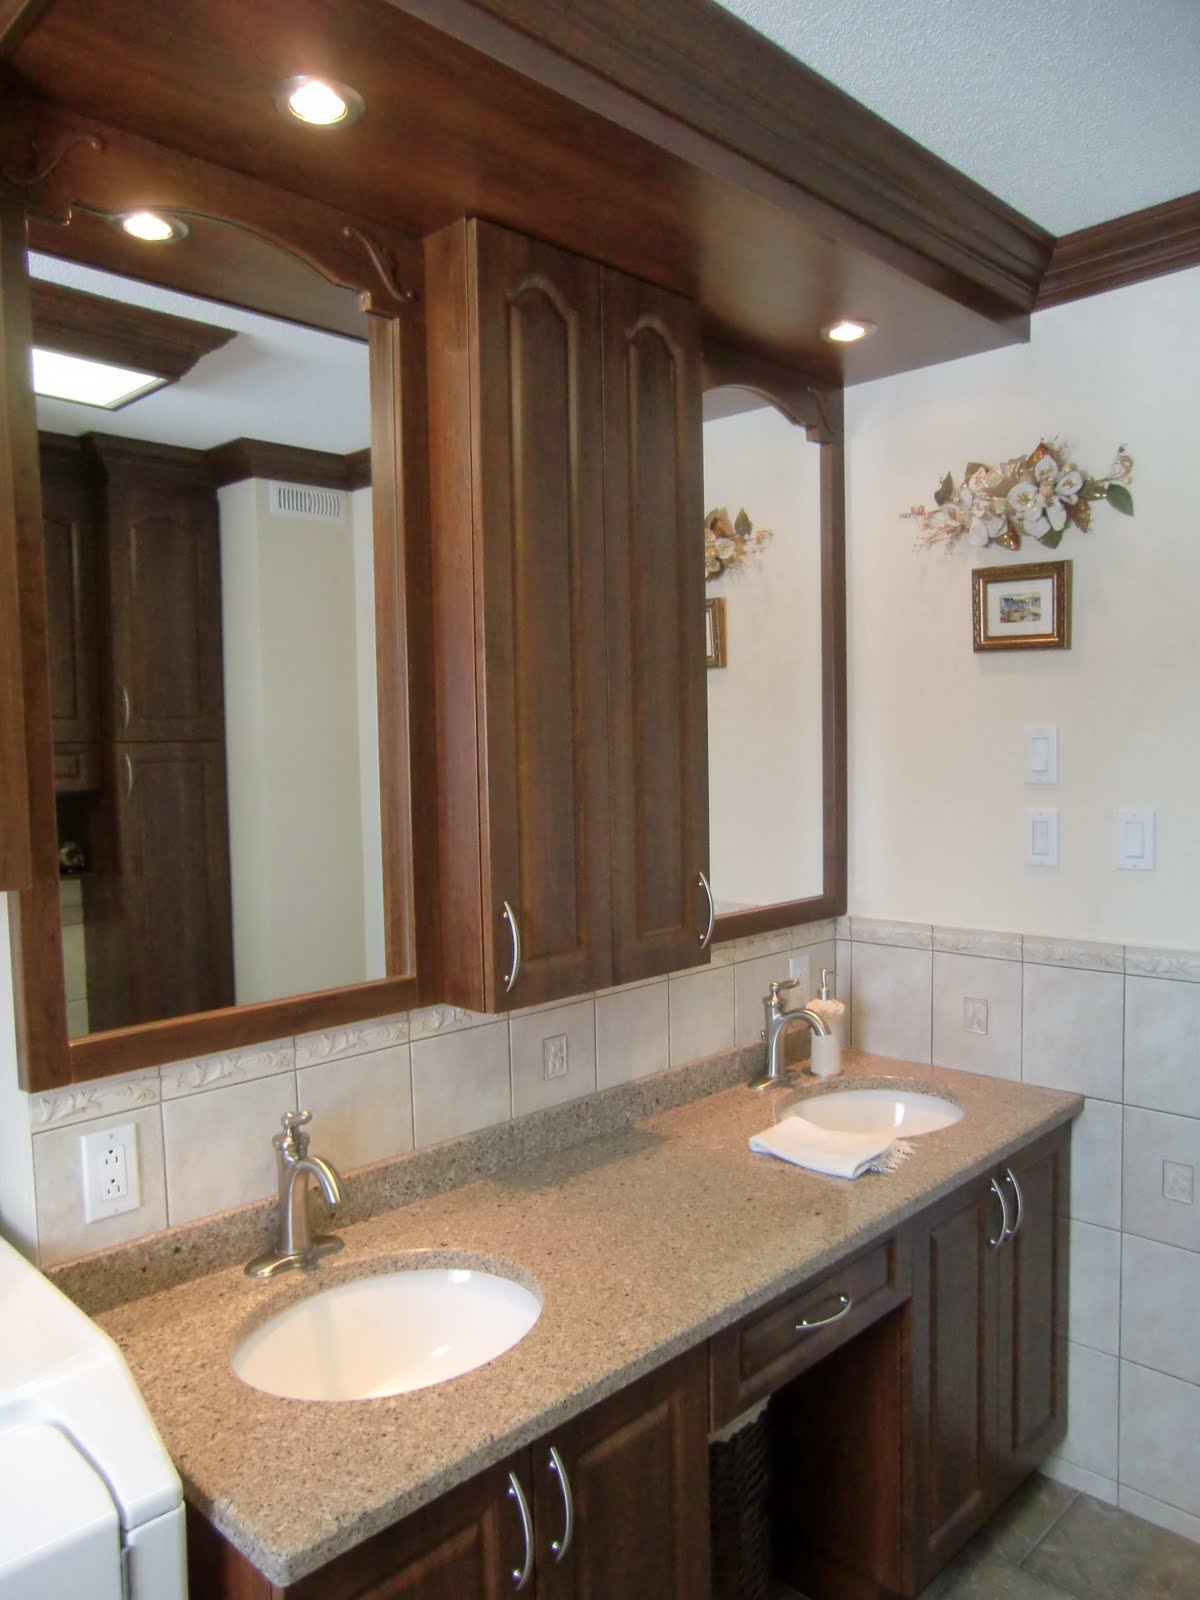 Specialit smm armoire de salle de bain en thermoplastique for Comptoir de salle de bain